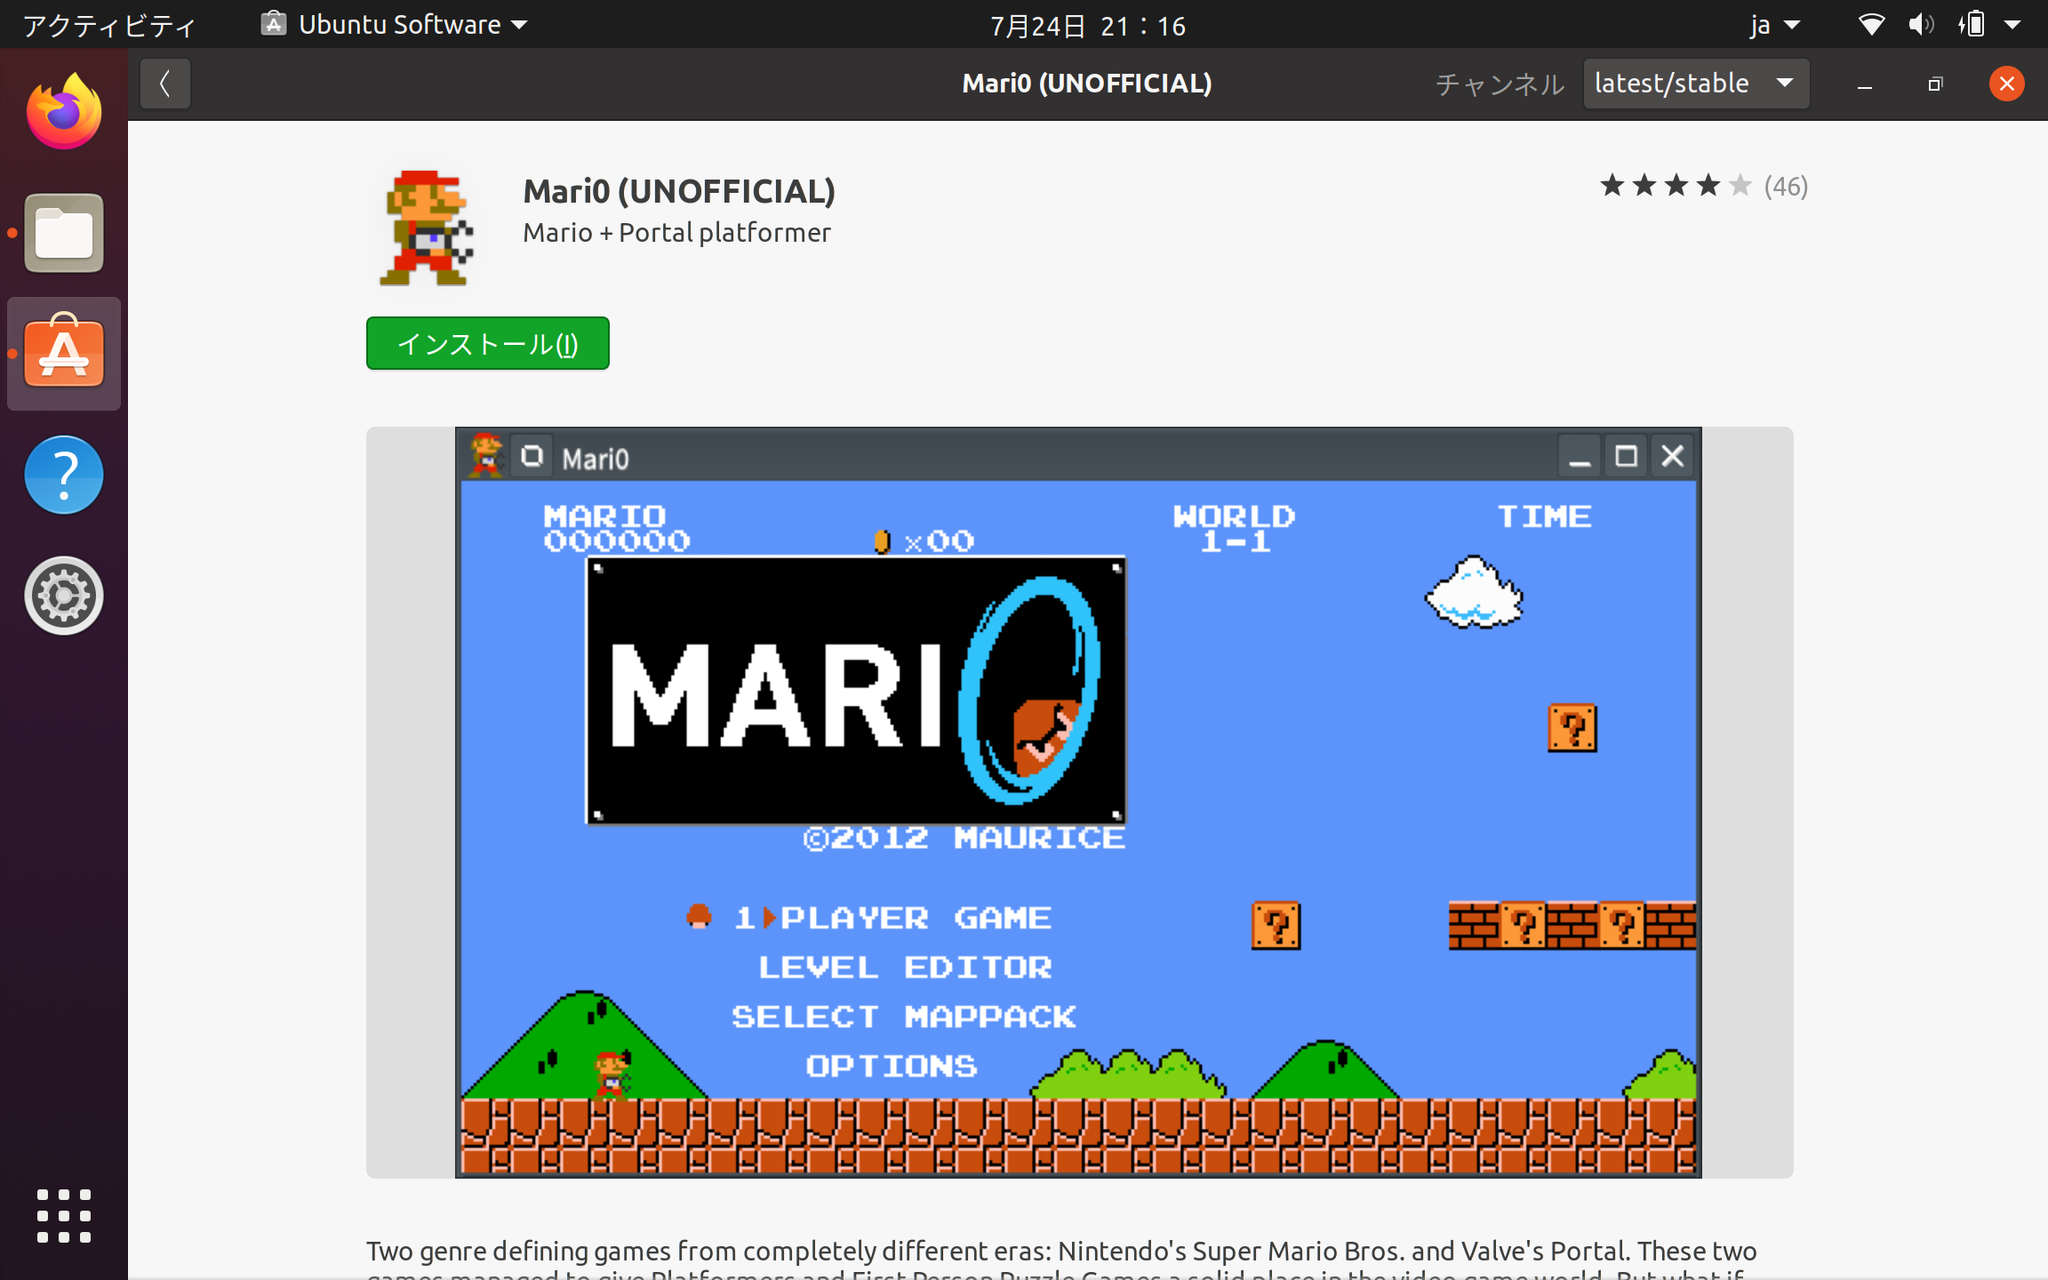 Dou mitemo Super Mario Brothers... :-) on Ubuntu Desktop https://t.co/HFcwHfzYZj